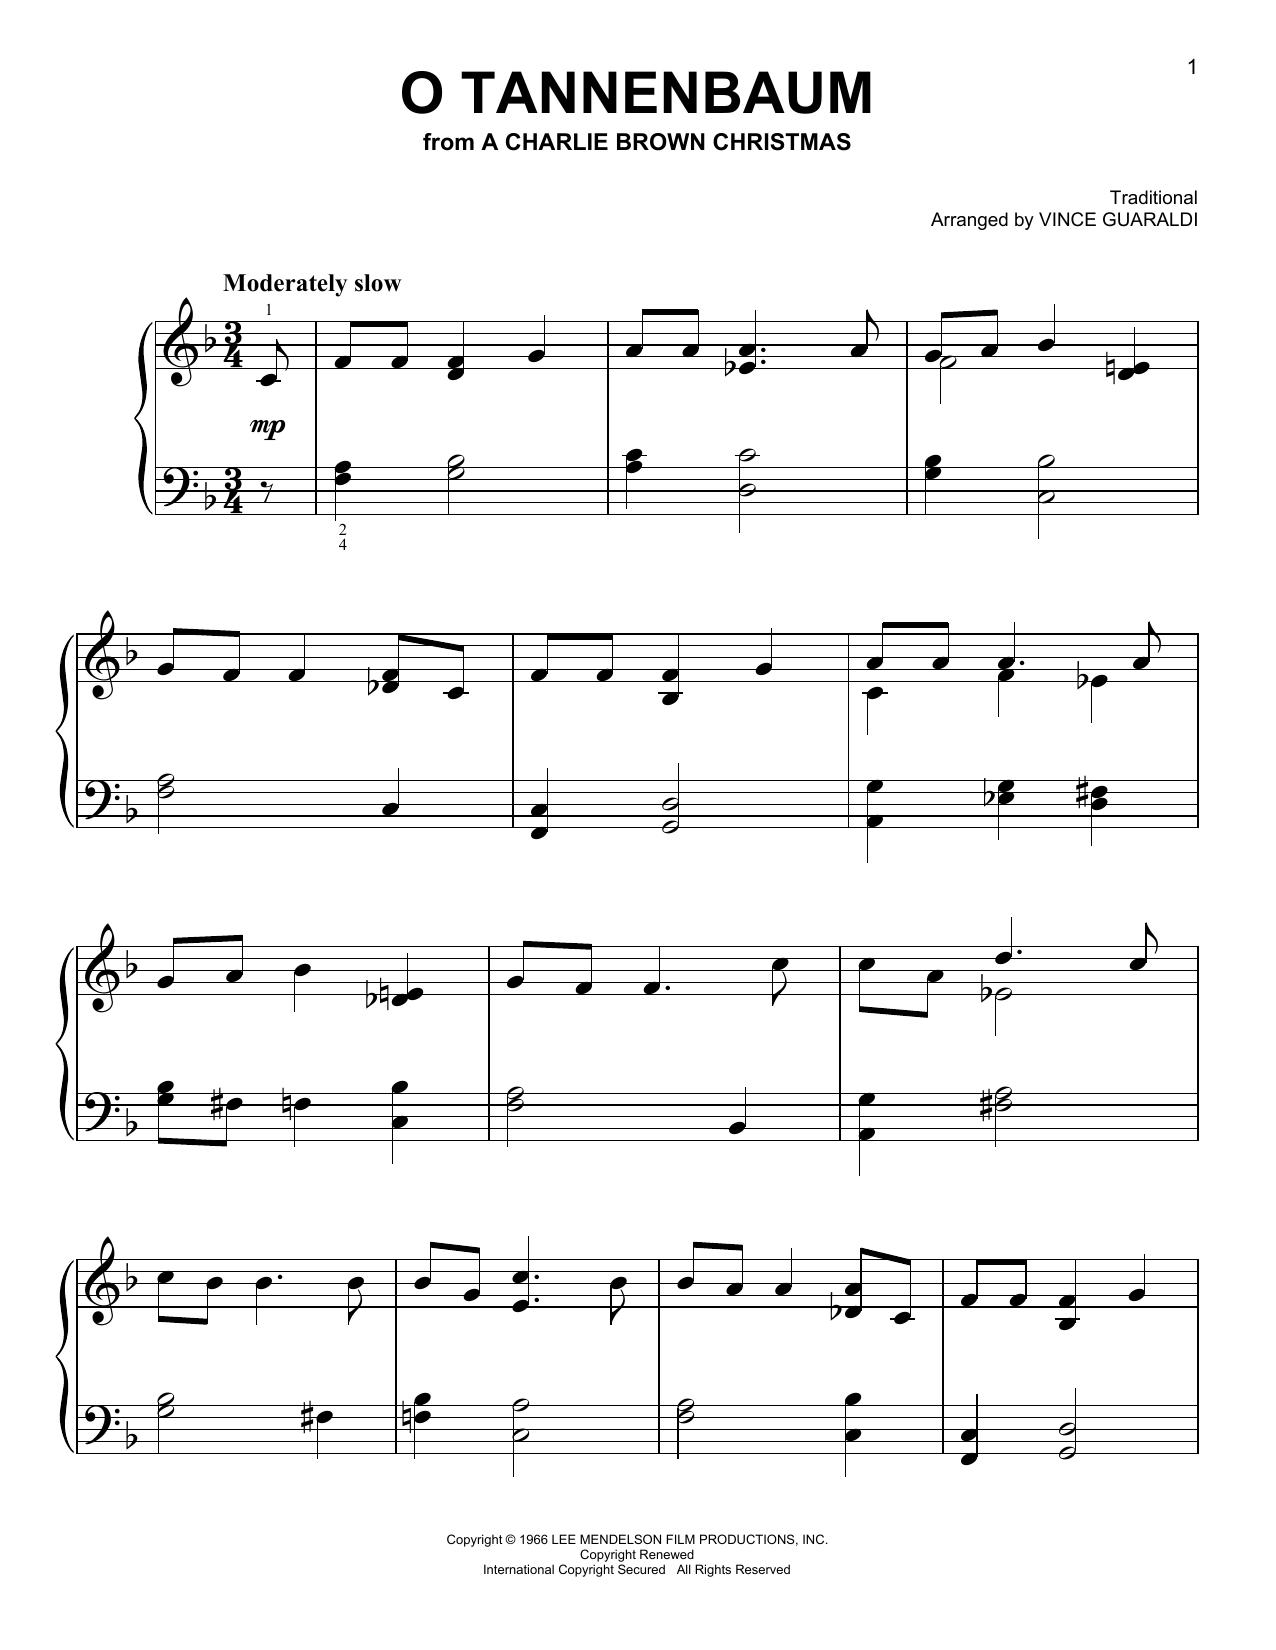 O Tannenbaum - Vince Guaraldi Trio in 2018 | Christmas sheet music ...